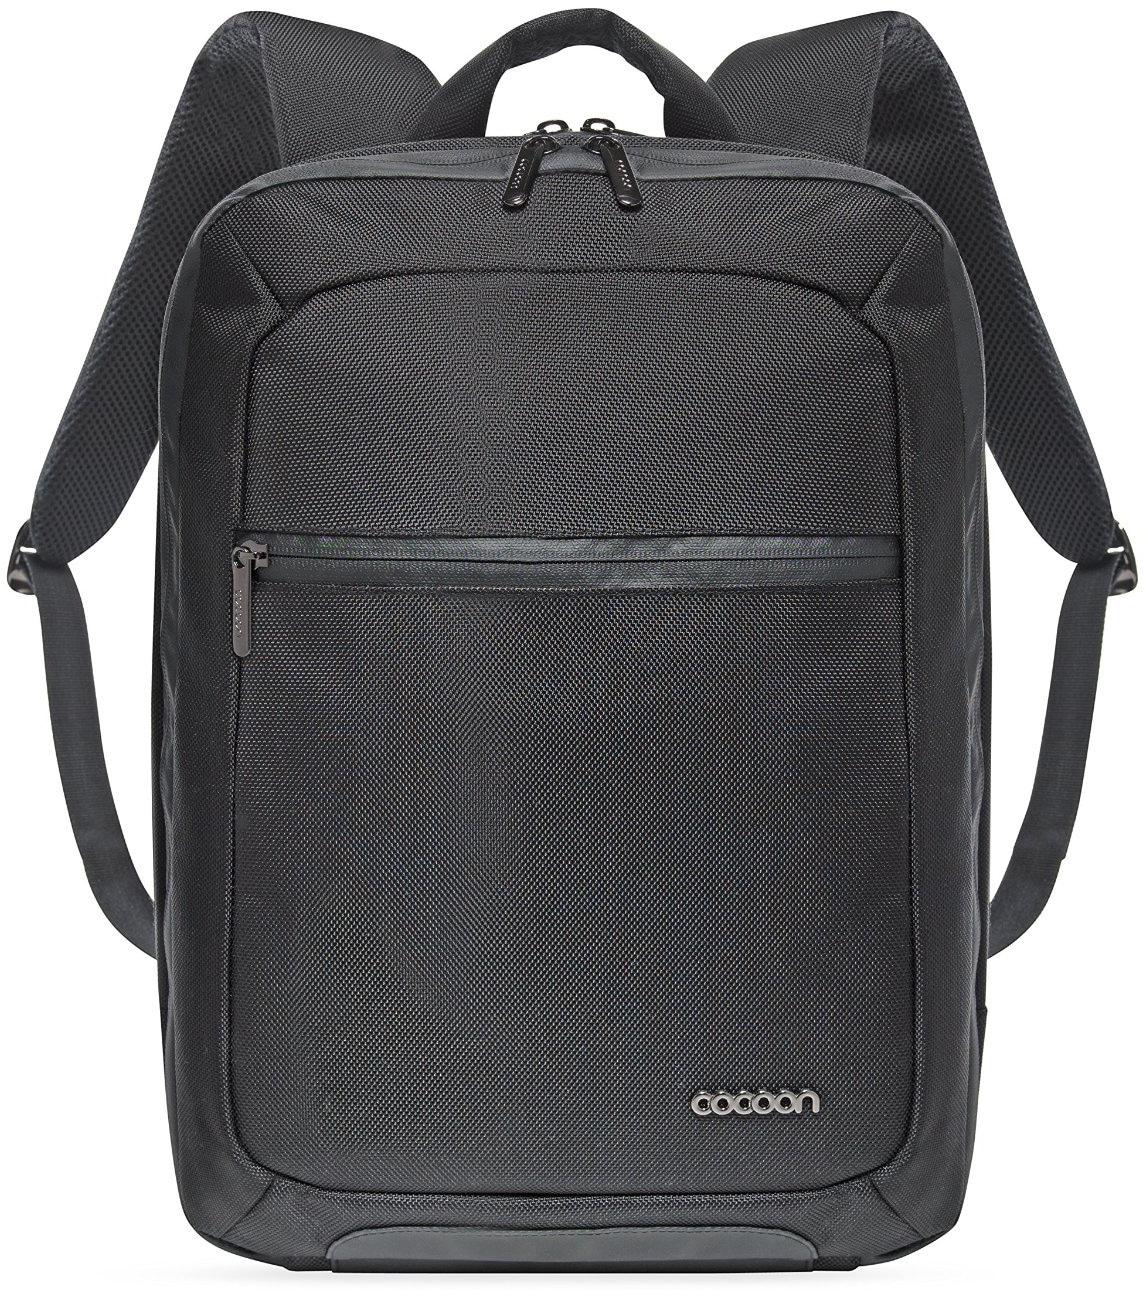 Рюкзак Cocoon Innovations Backpack (MCP3401BK) для ноутбука 15'' (Black)